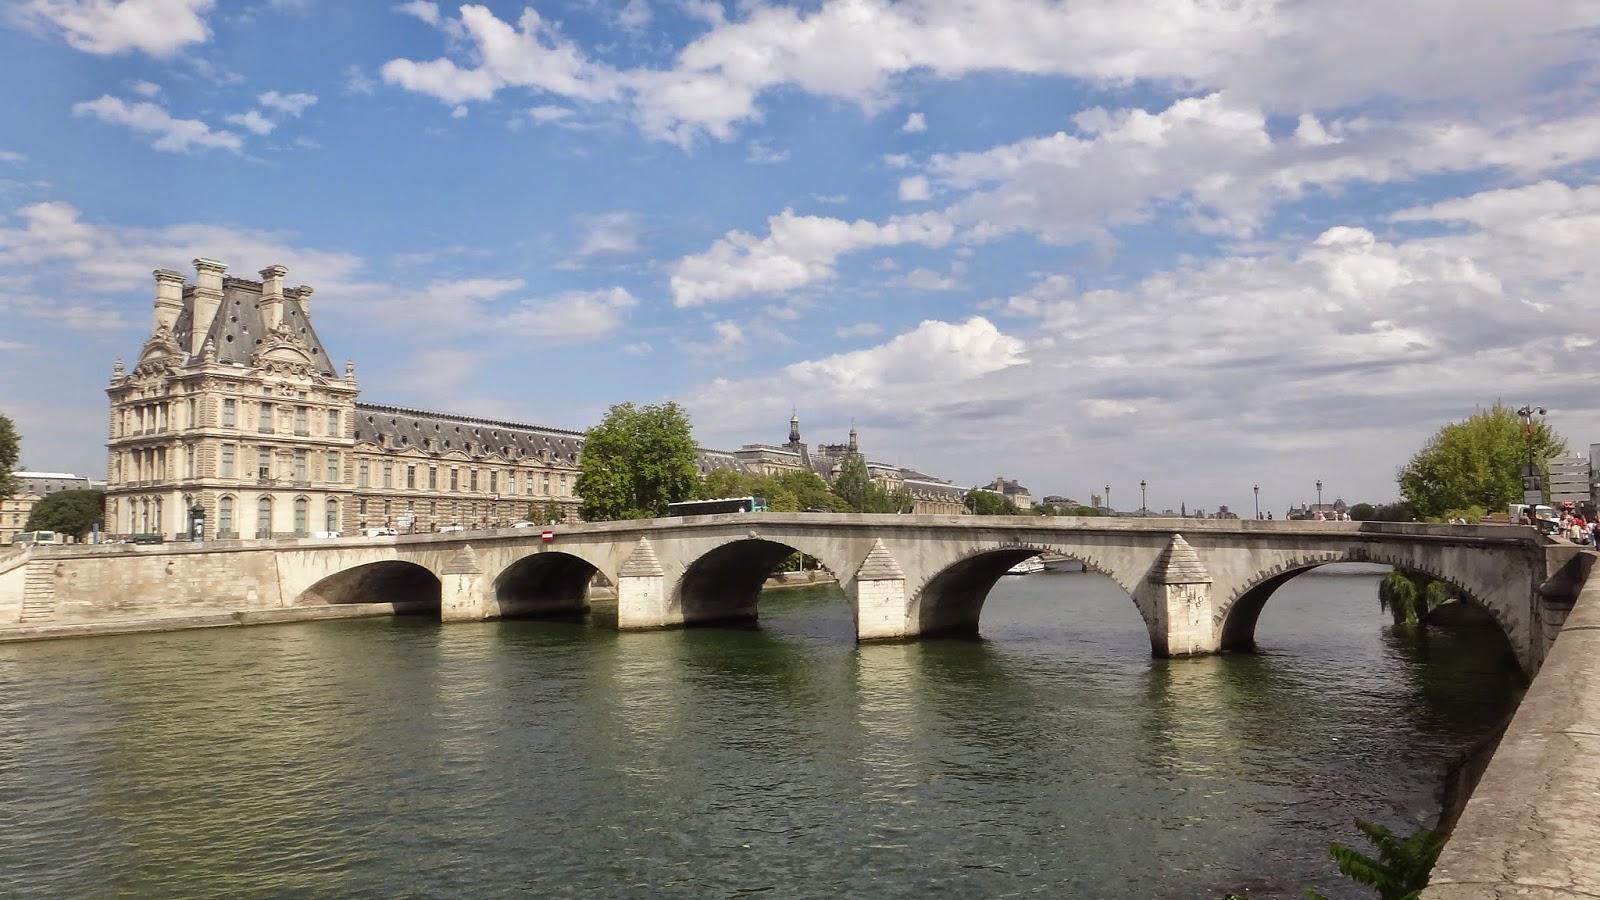 pont royal paris historic walks. Black Bedroom Furniture Sets. Home Design Ideas